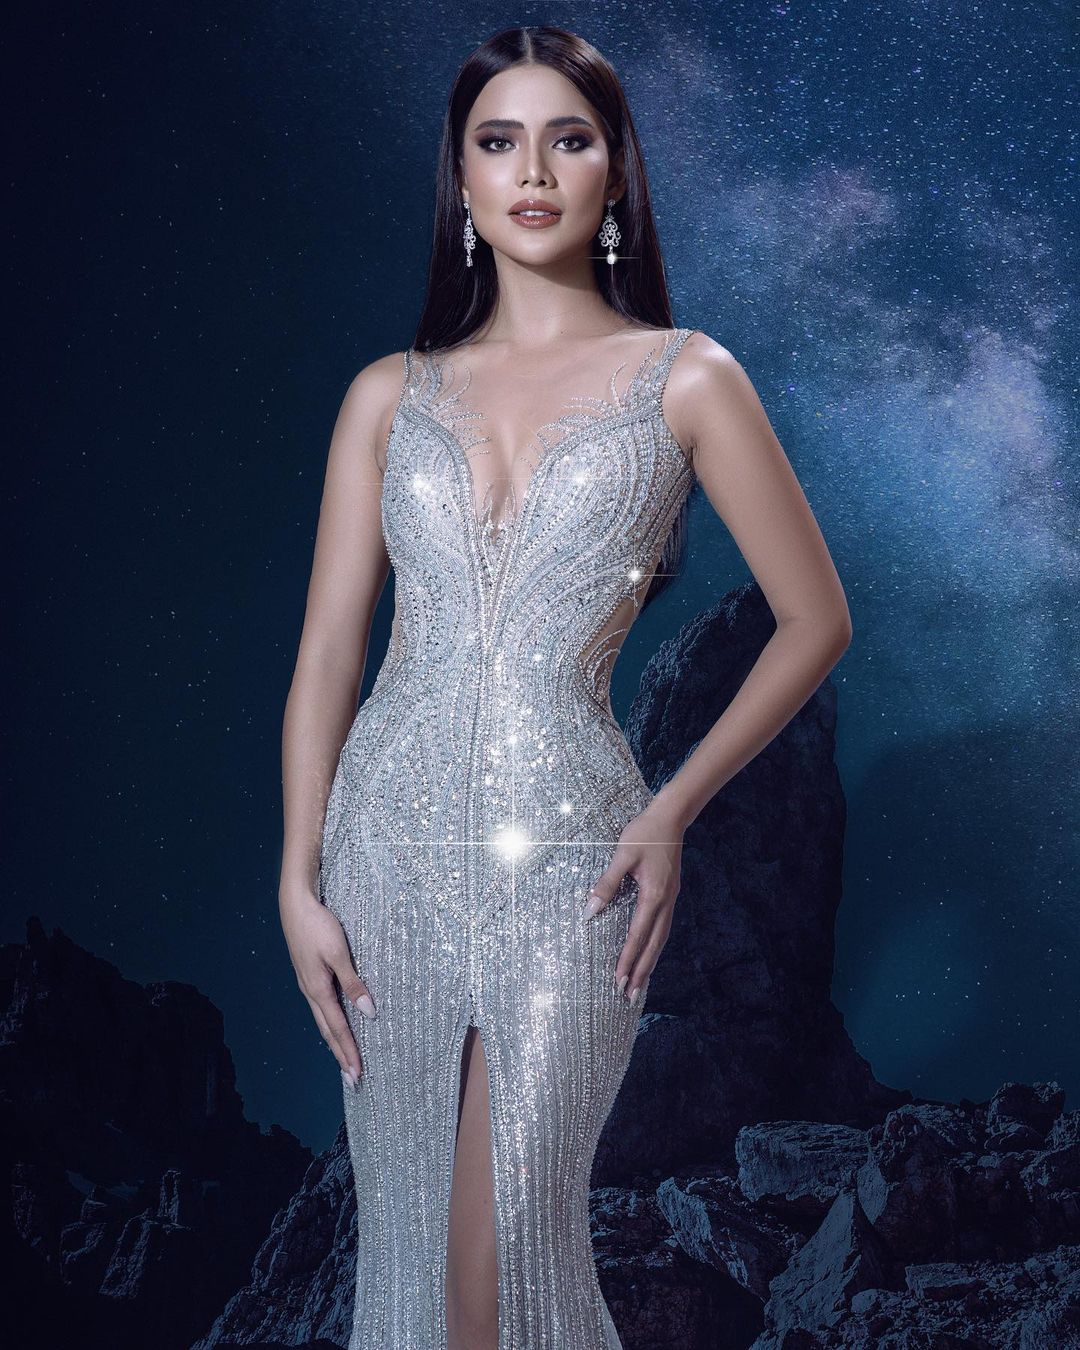 miss-universe-laguna-leren-bautista-evening-gown-photo